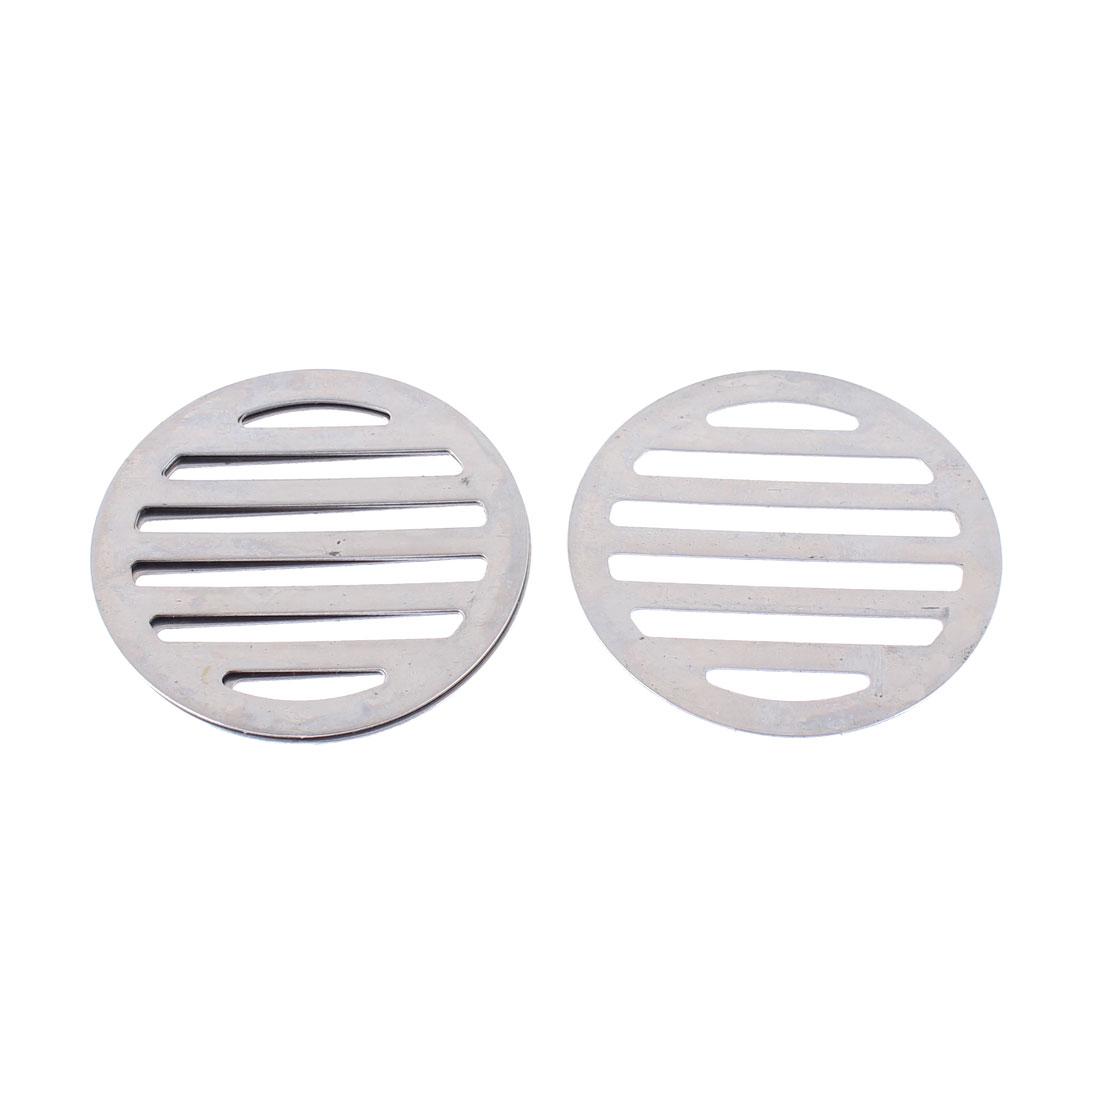 "Stainless Steel Kitchen Bathroom Round Floor Drain Cover 3"" 7.5cm 4Pcs"